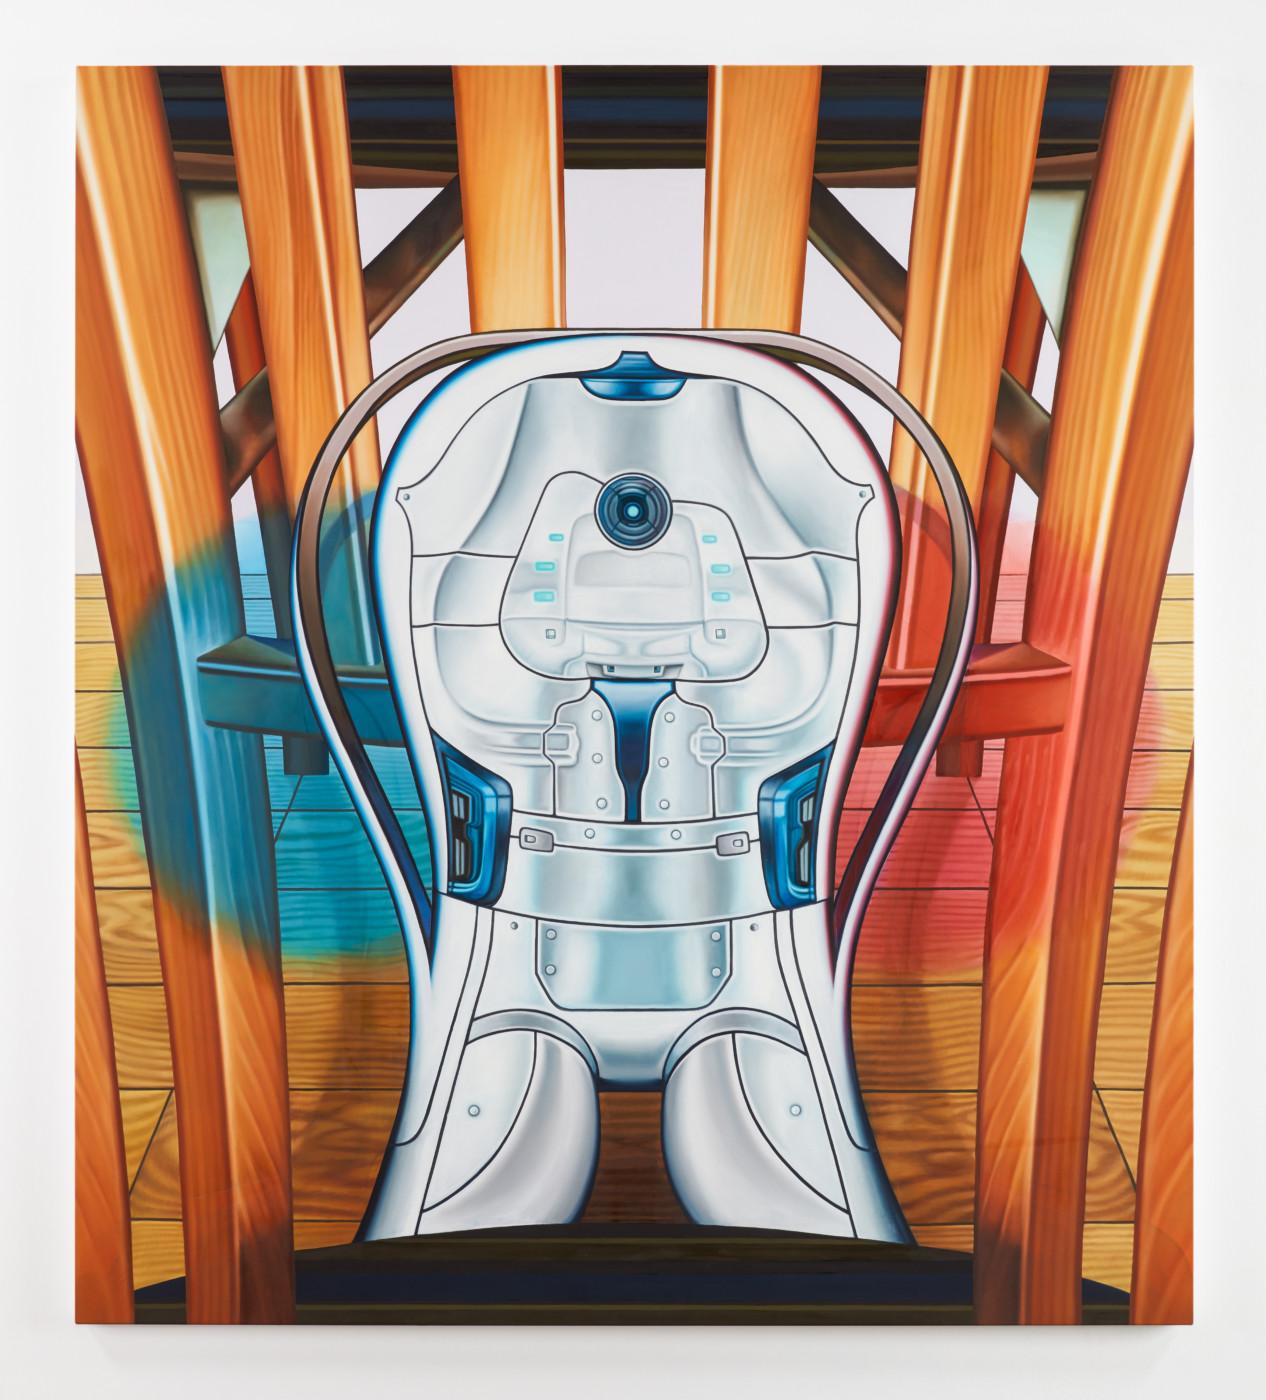 TÊTE  Hangar</I>, 2019 Oil on canvas 182.9 x 162.6 cm / 72 x 64 in  ORION MARTIN